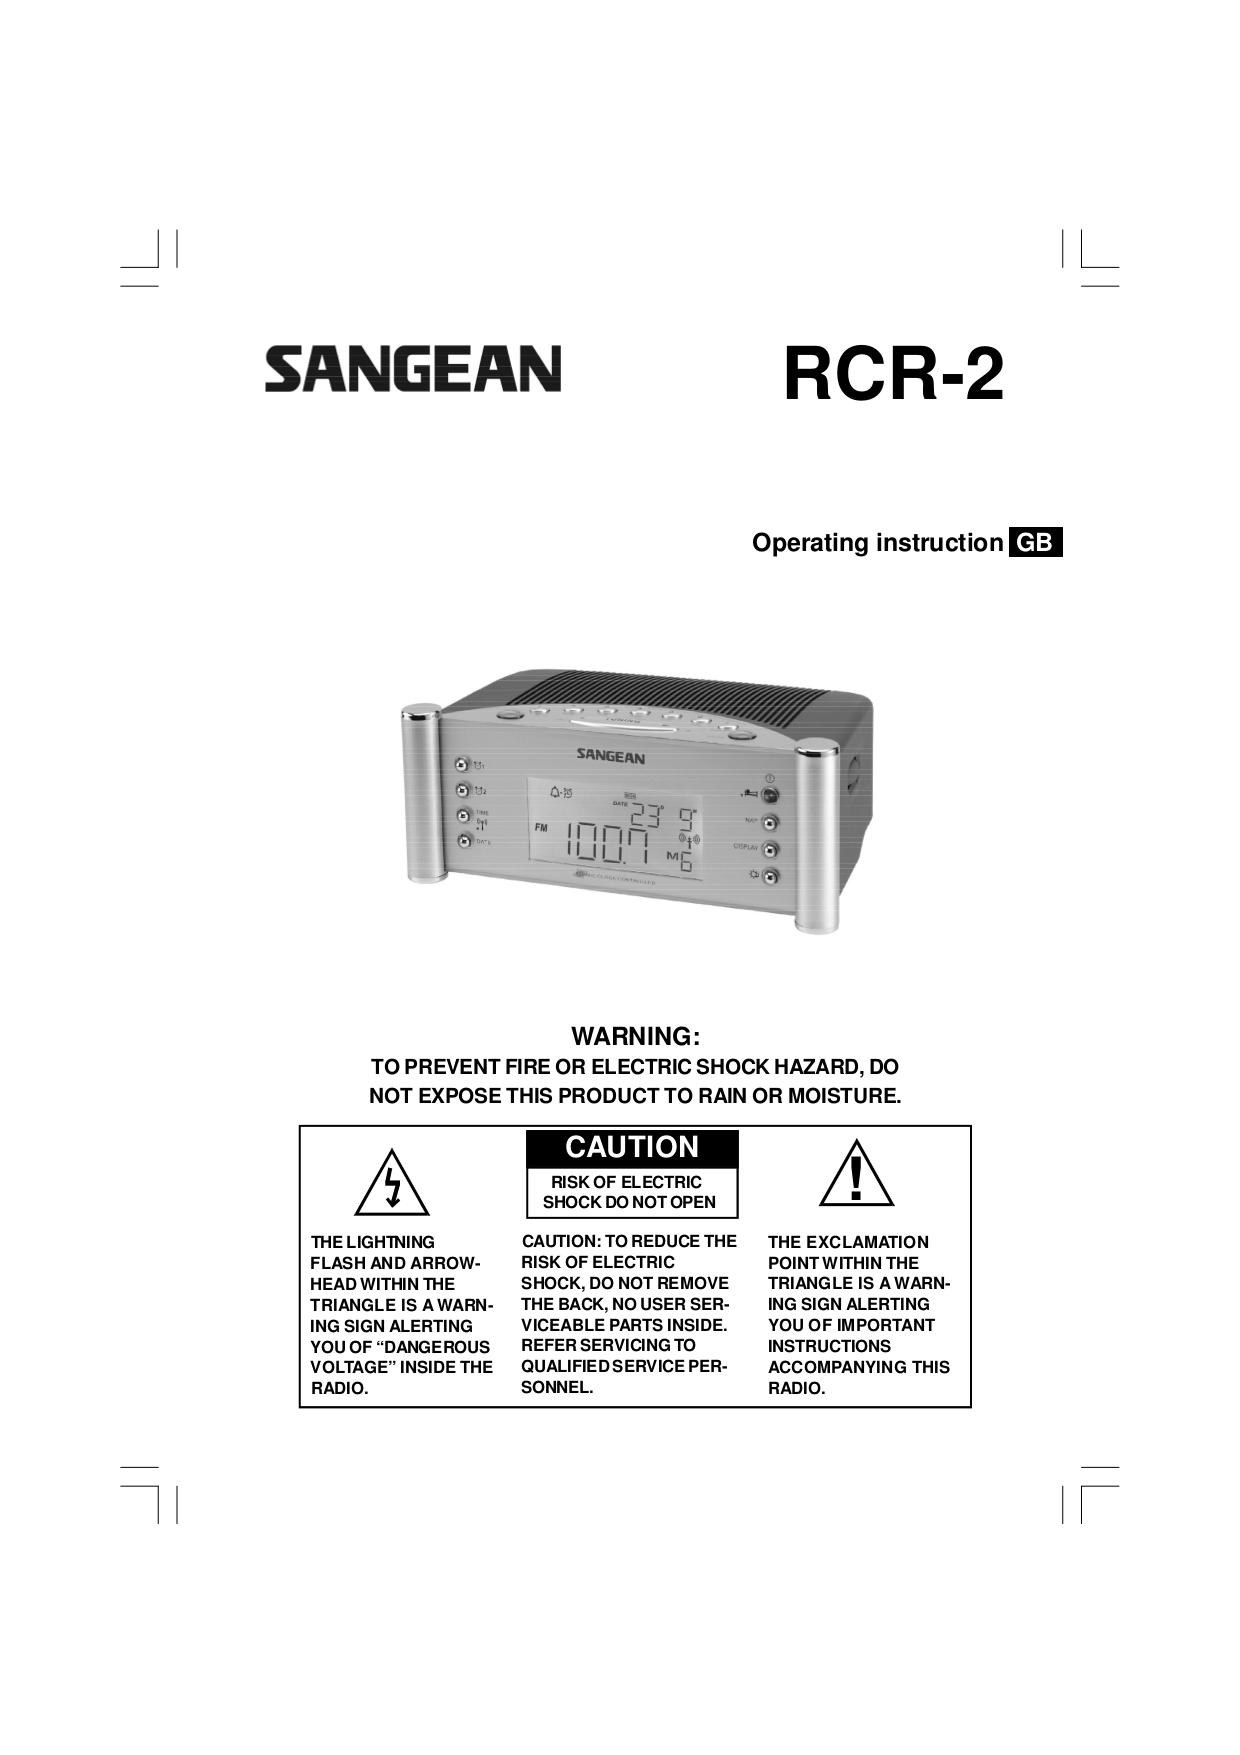 download free pdf for sangean rcr 2 clock radio manual rh umlib com sangean rcr 5 digital am fm clock radio manual sangean dcr-89 plus digital clock radio manual